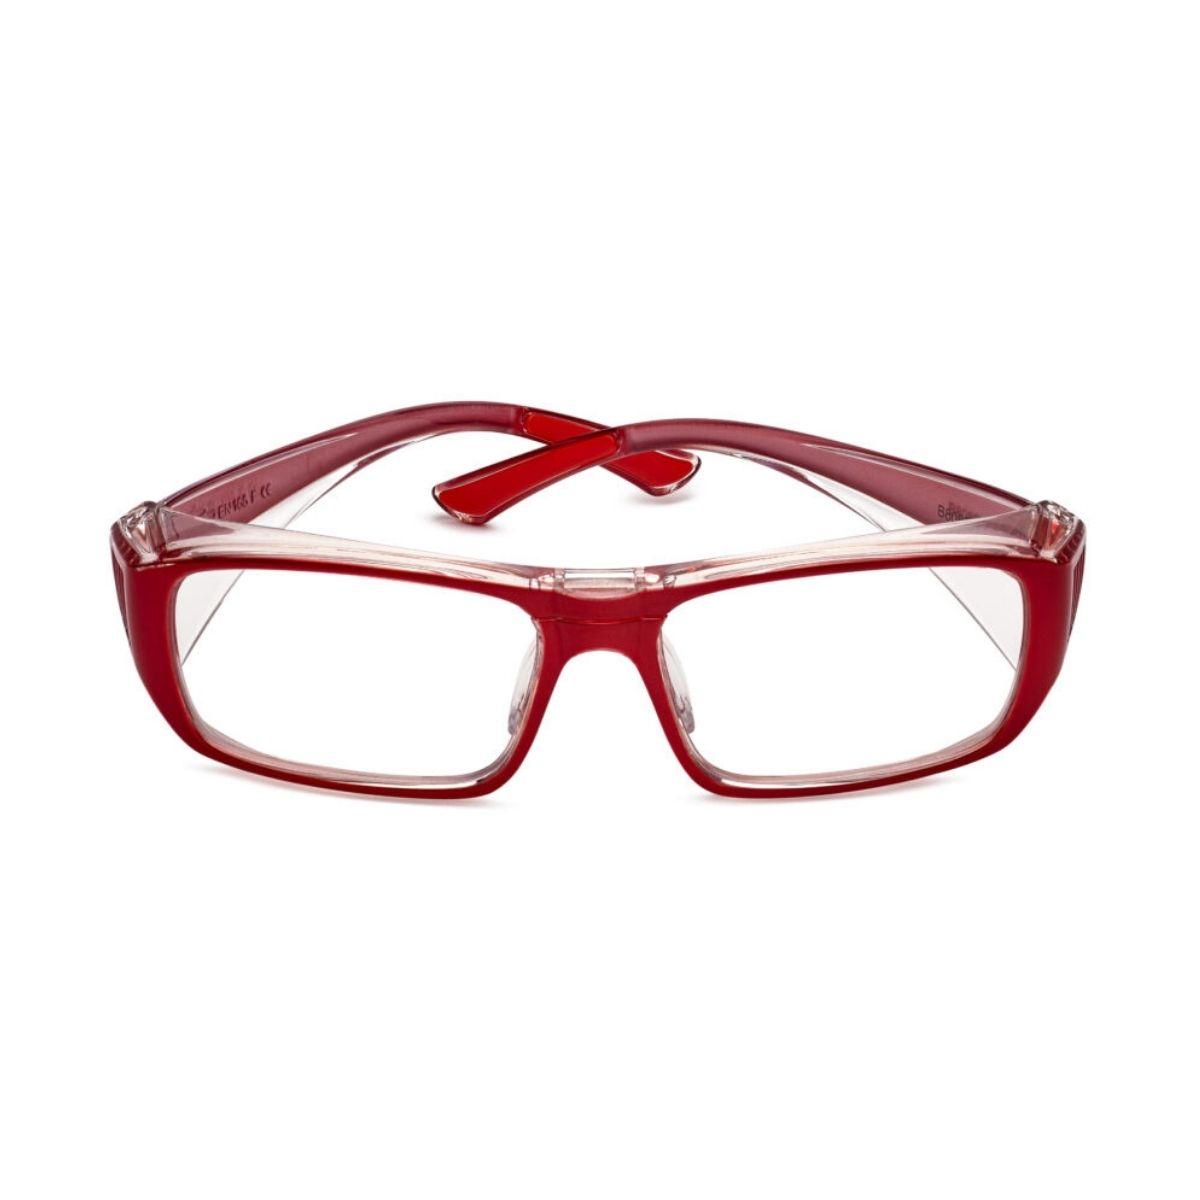 Red prescription safety glasses